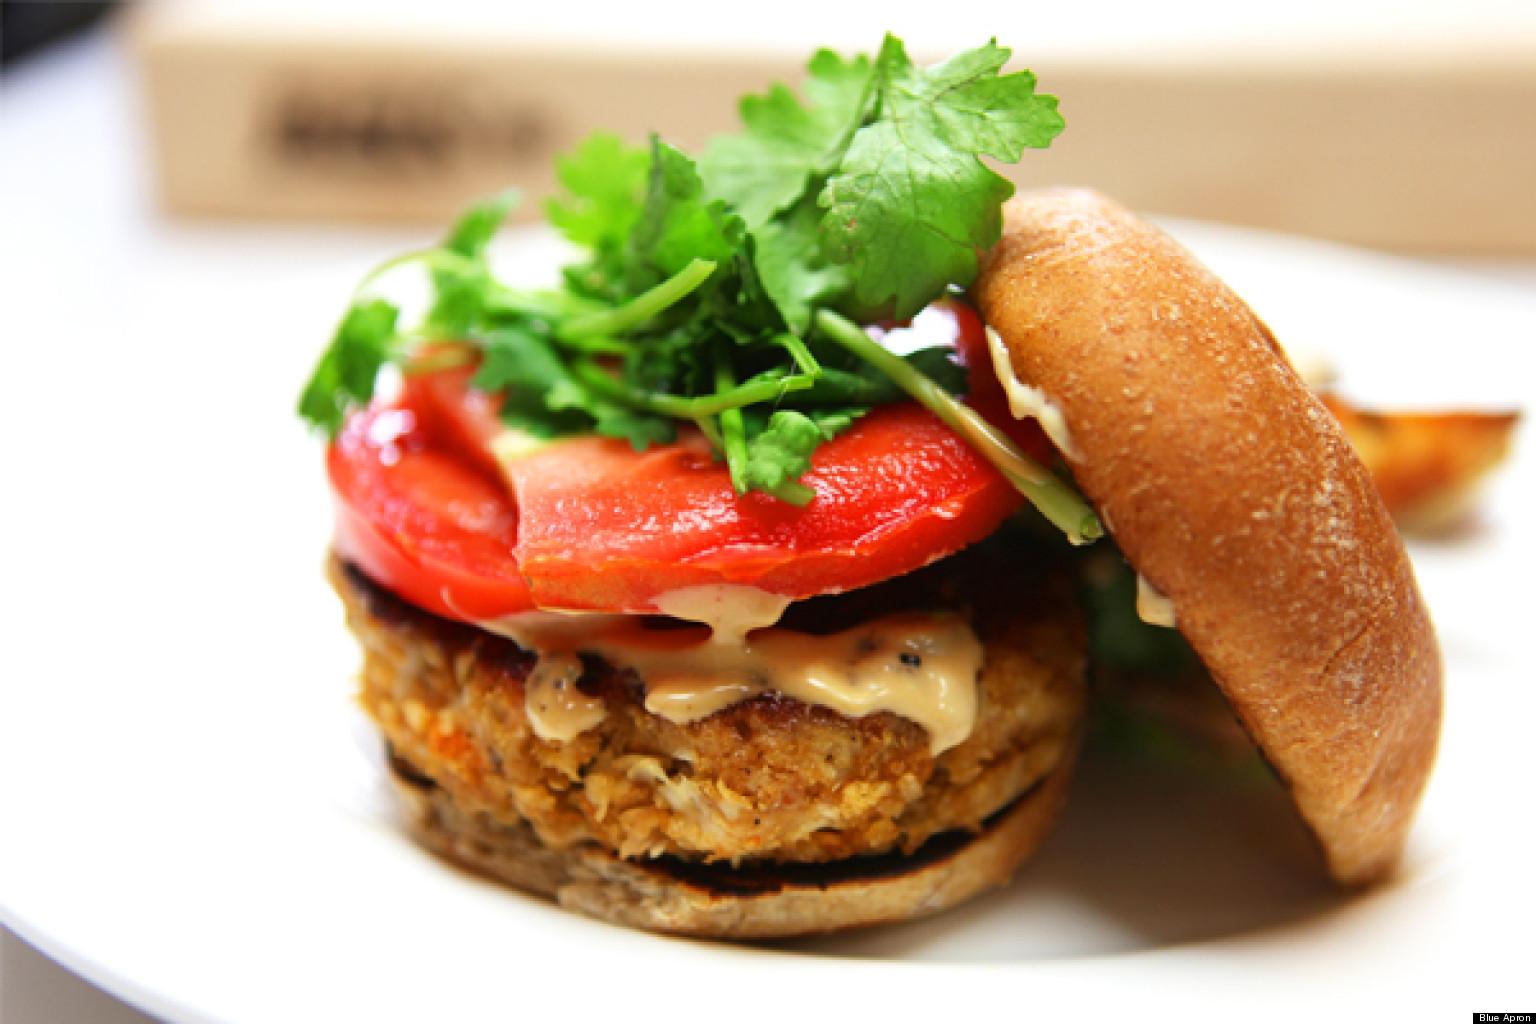 Blue apron lemongrass burger - Blue Apron Lemongrass Burger 8